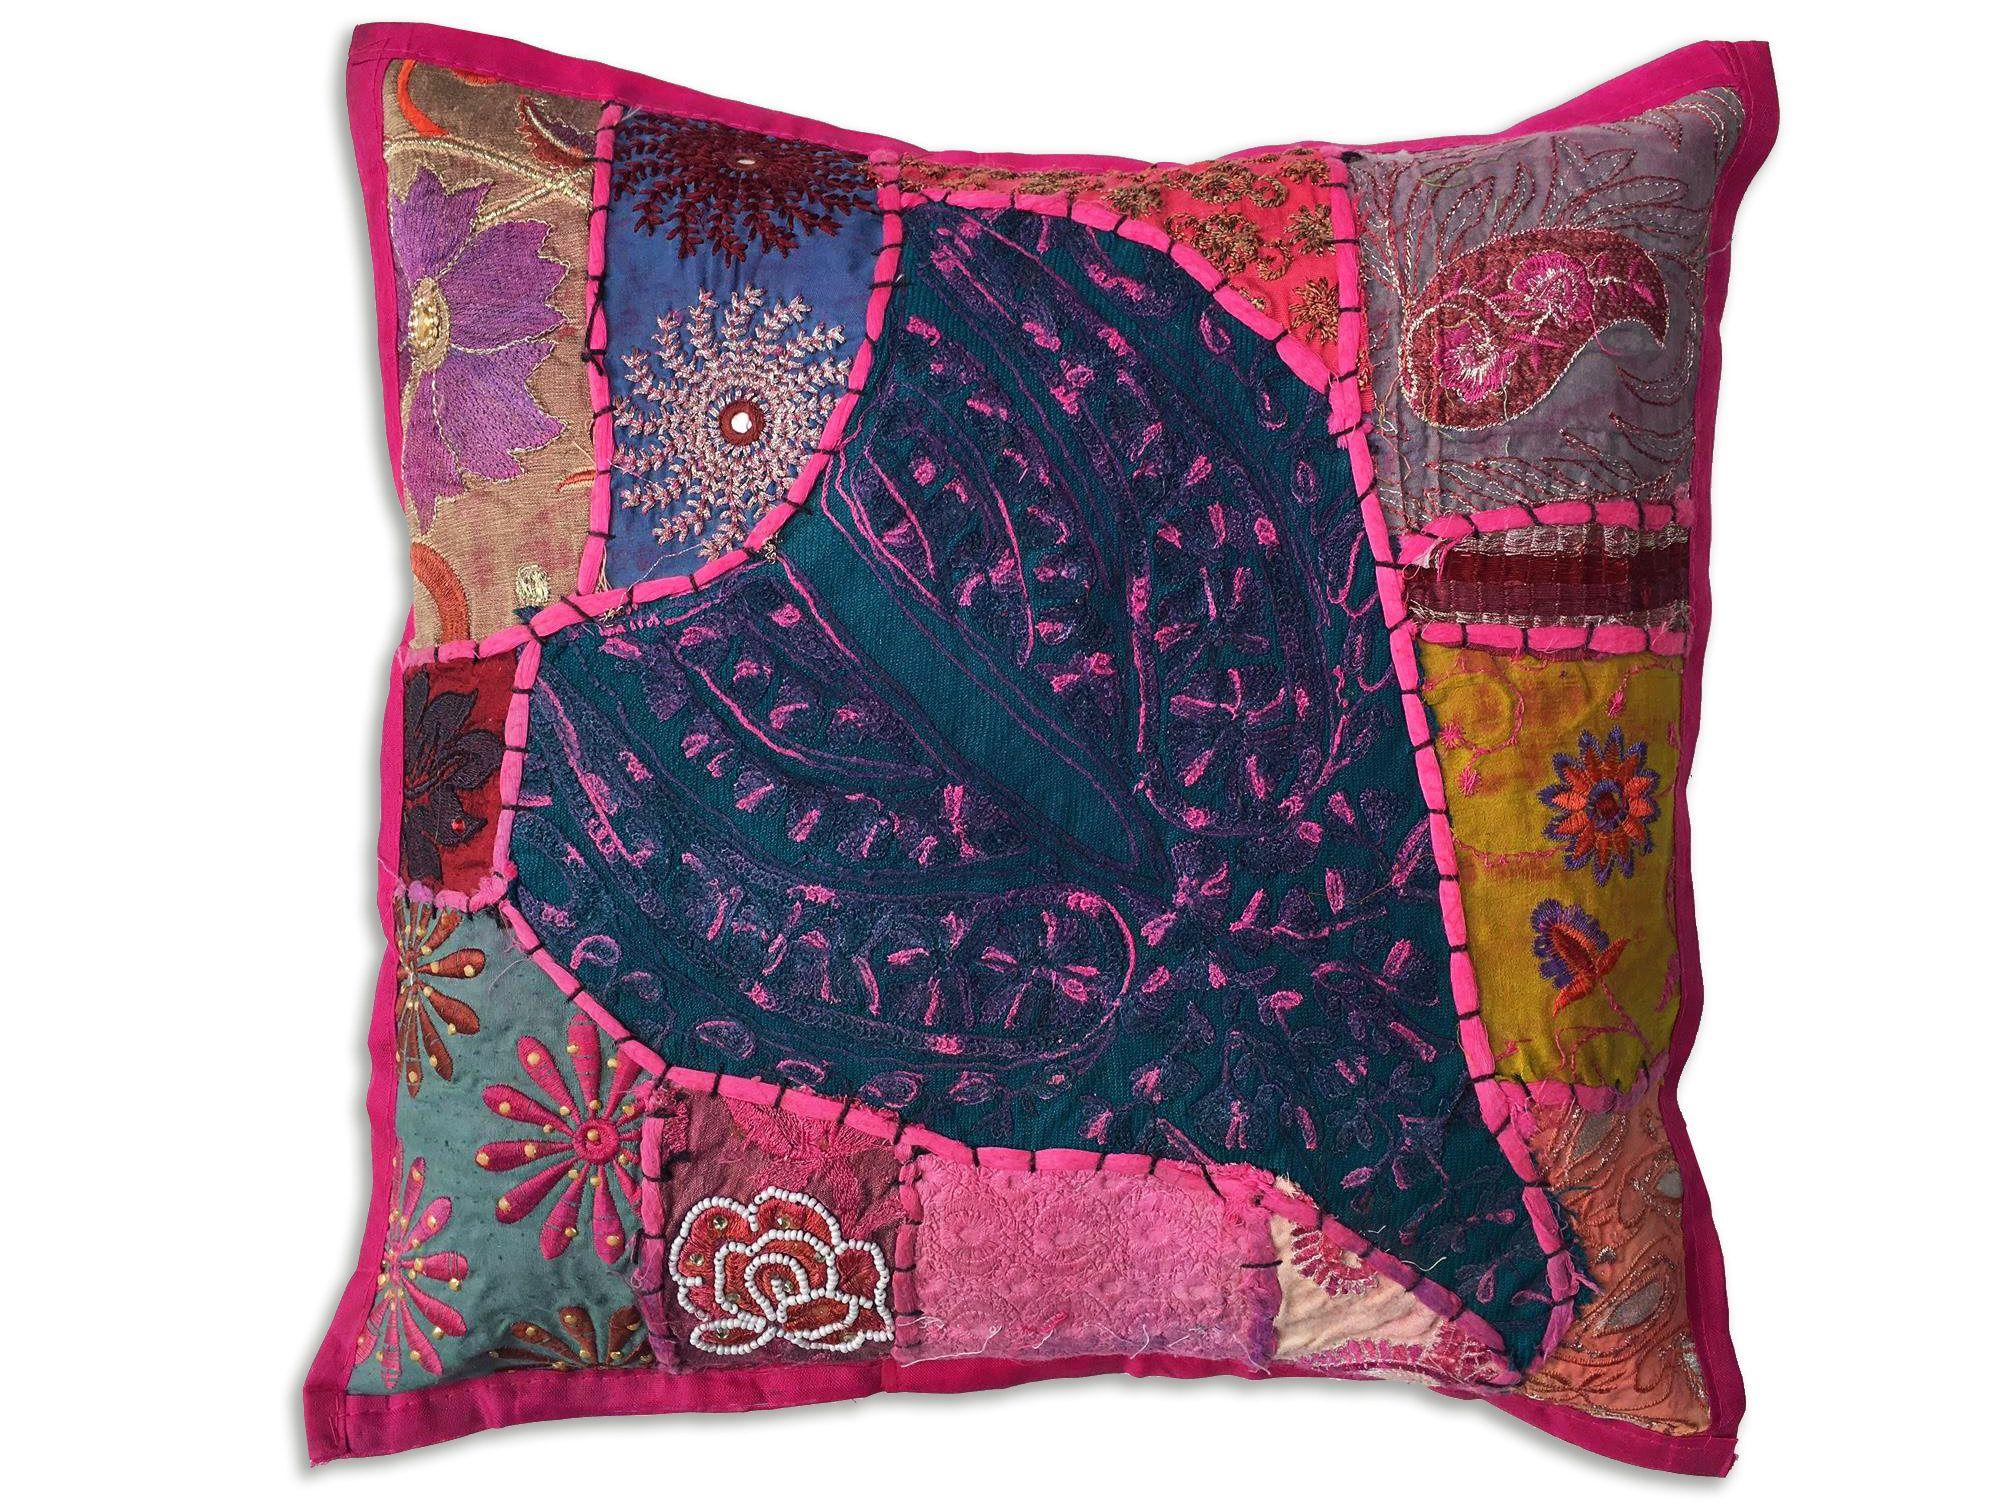 Etsy Throw Pillows Vintage Pillows For Home Decore Boho Cushion Covers Hindu